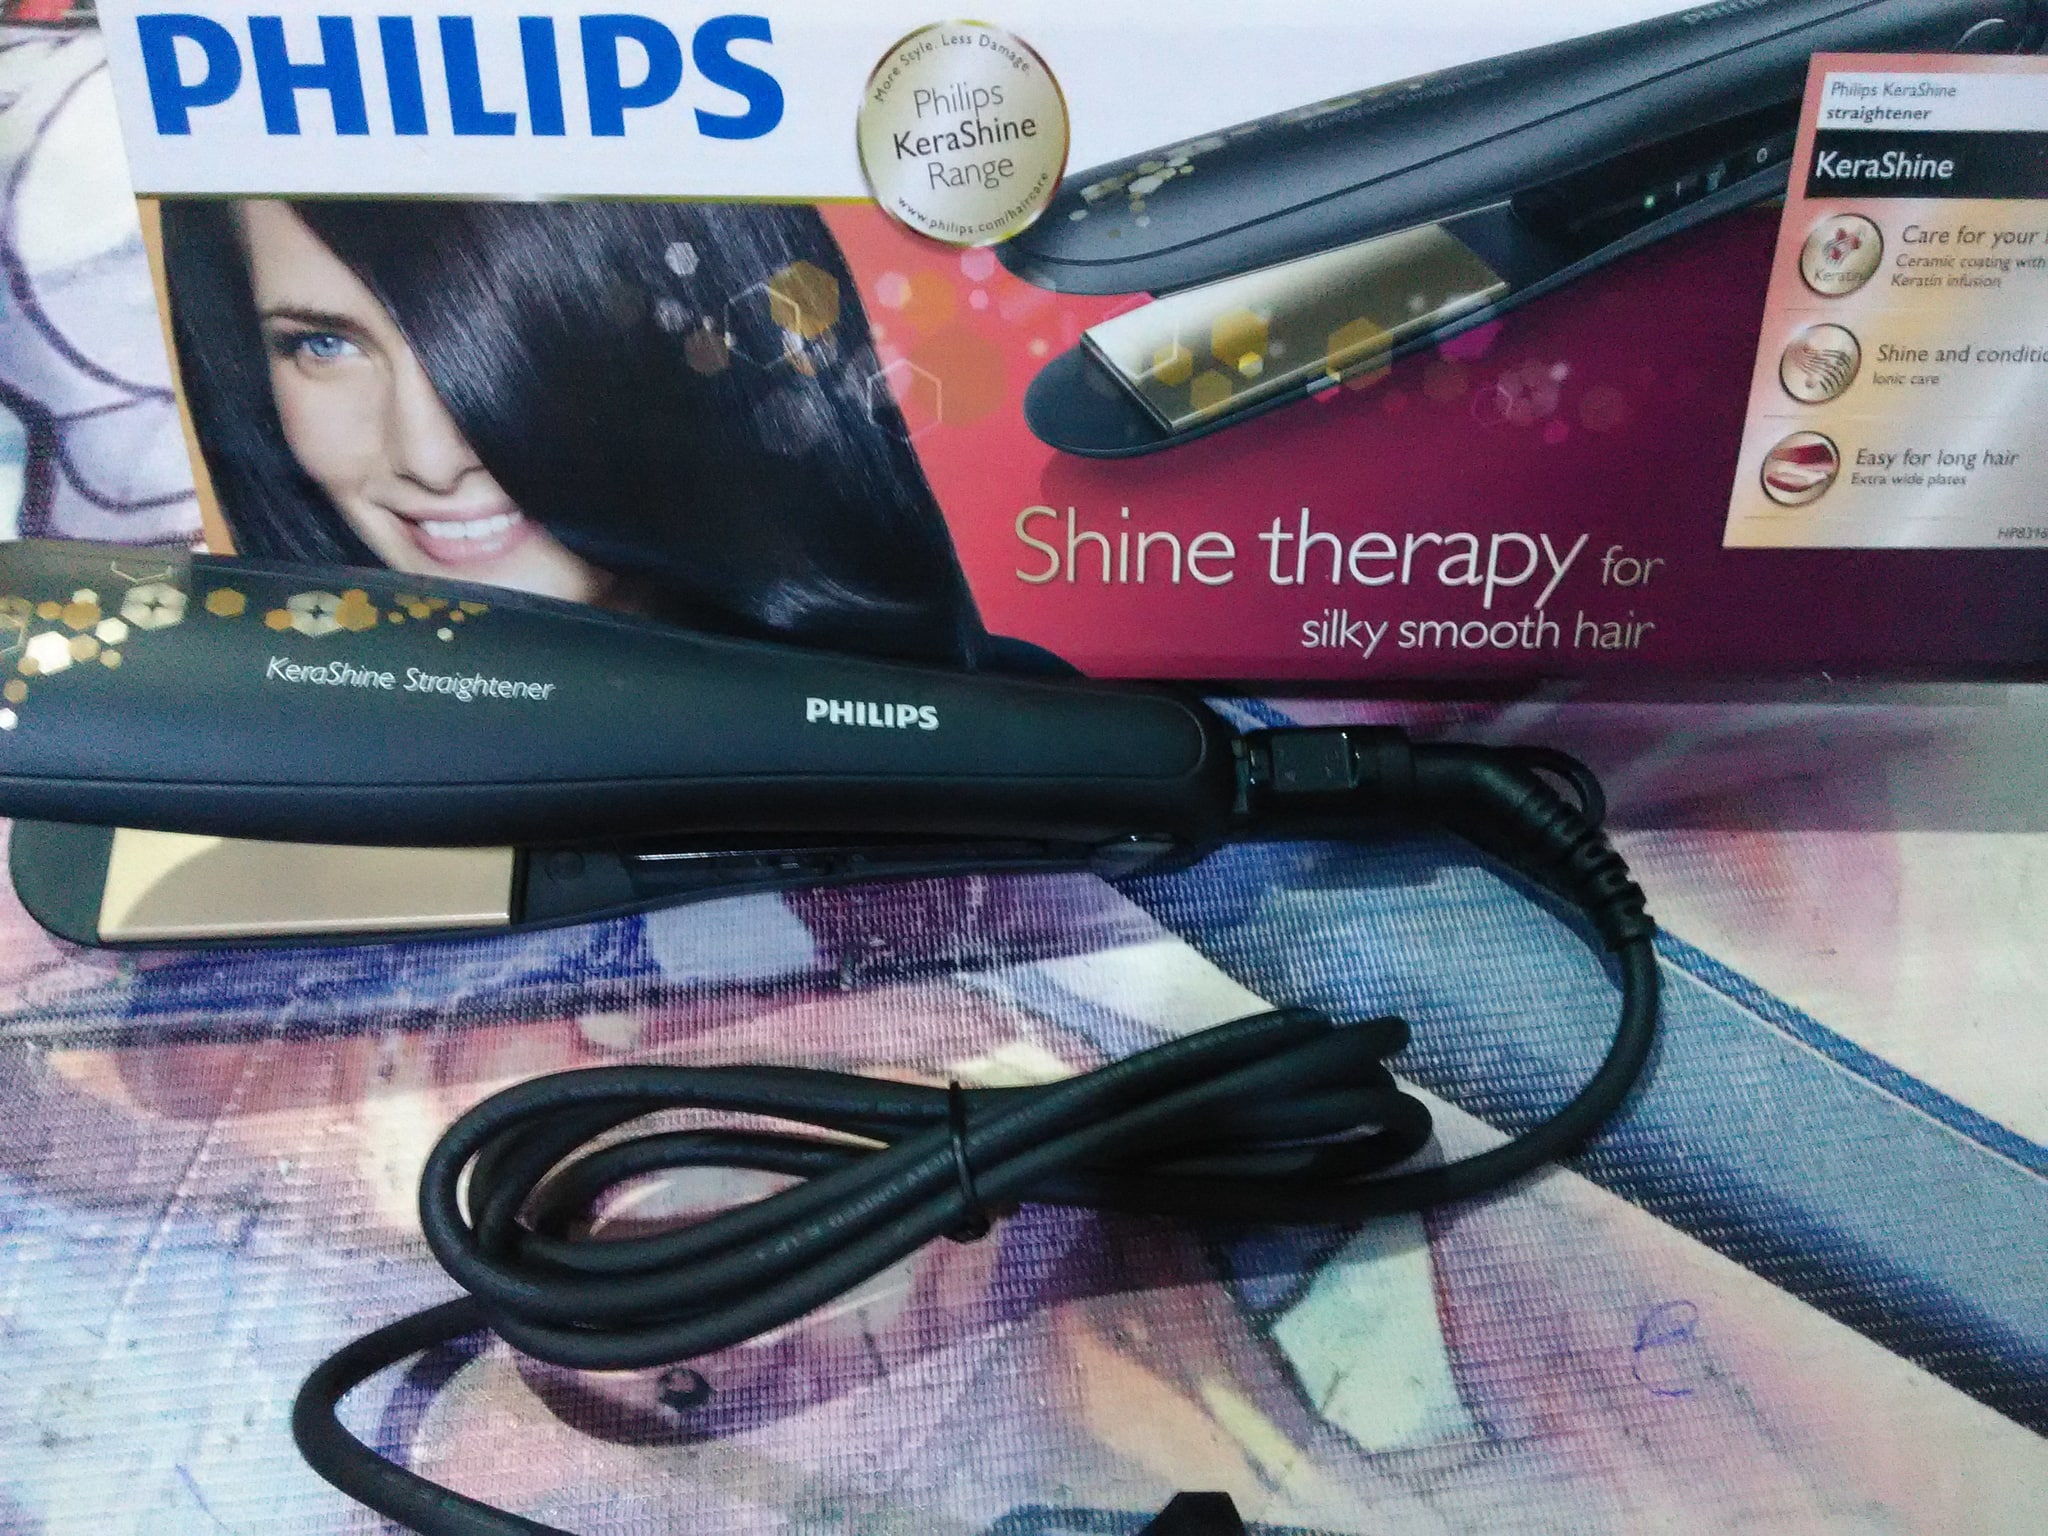 Philips Straightener Catokan Modern Hp8302 Page 4 Daftar Update Catok Hp 8302 Pelurus Hair Keramik Jual Kerashine 8316 Rambut Goda Gado Bali Tokopedia